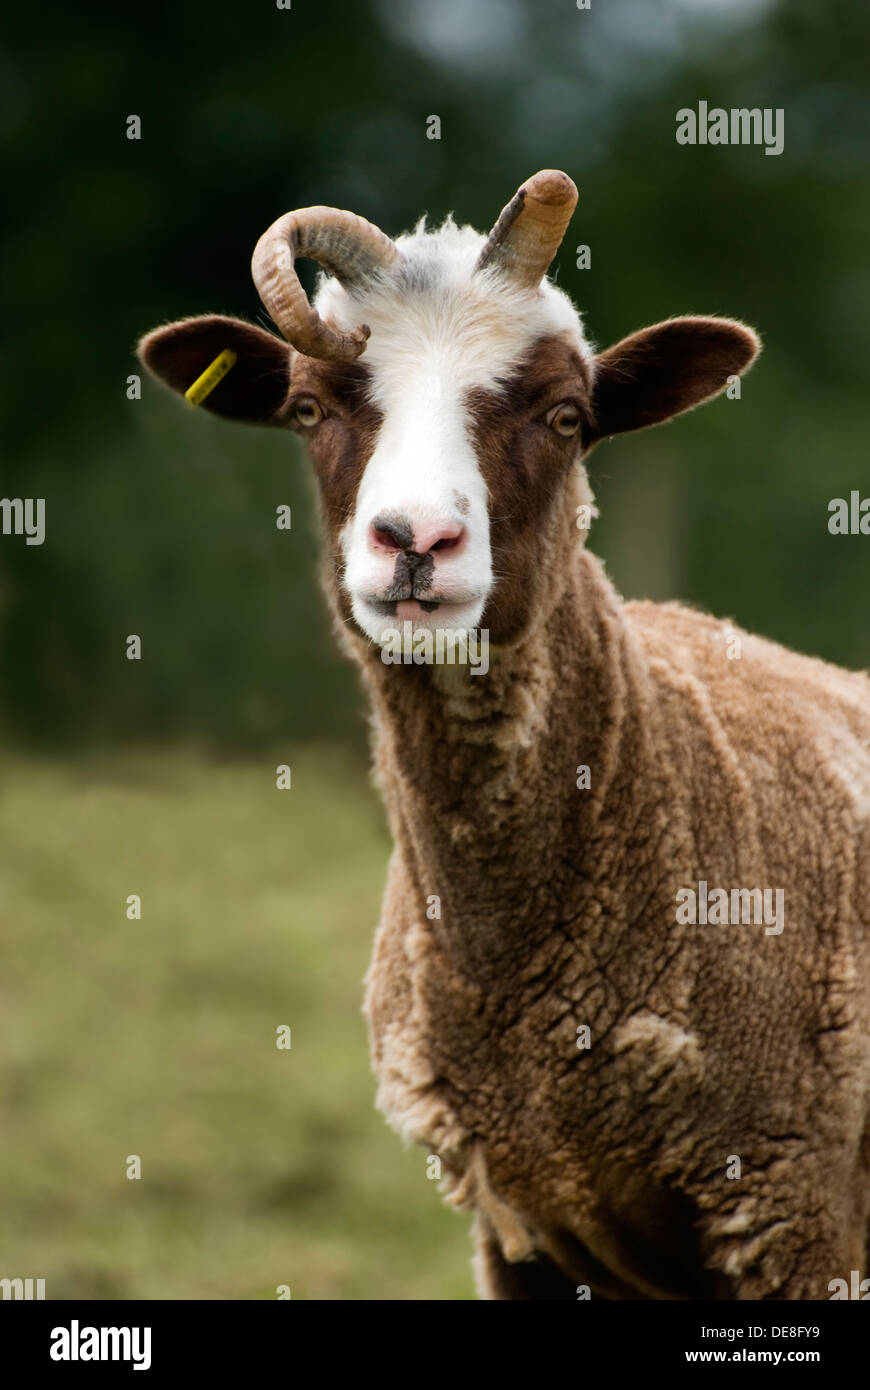 Manx Loaghtan sheep - Stock Image